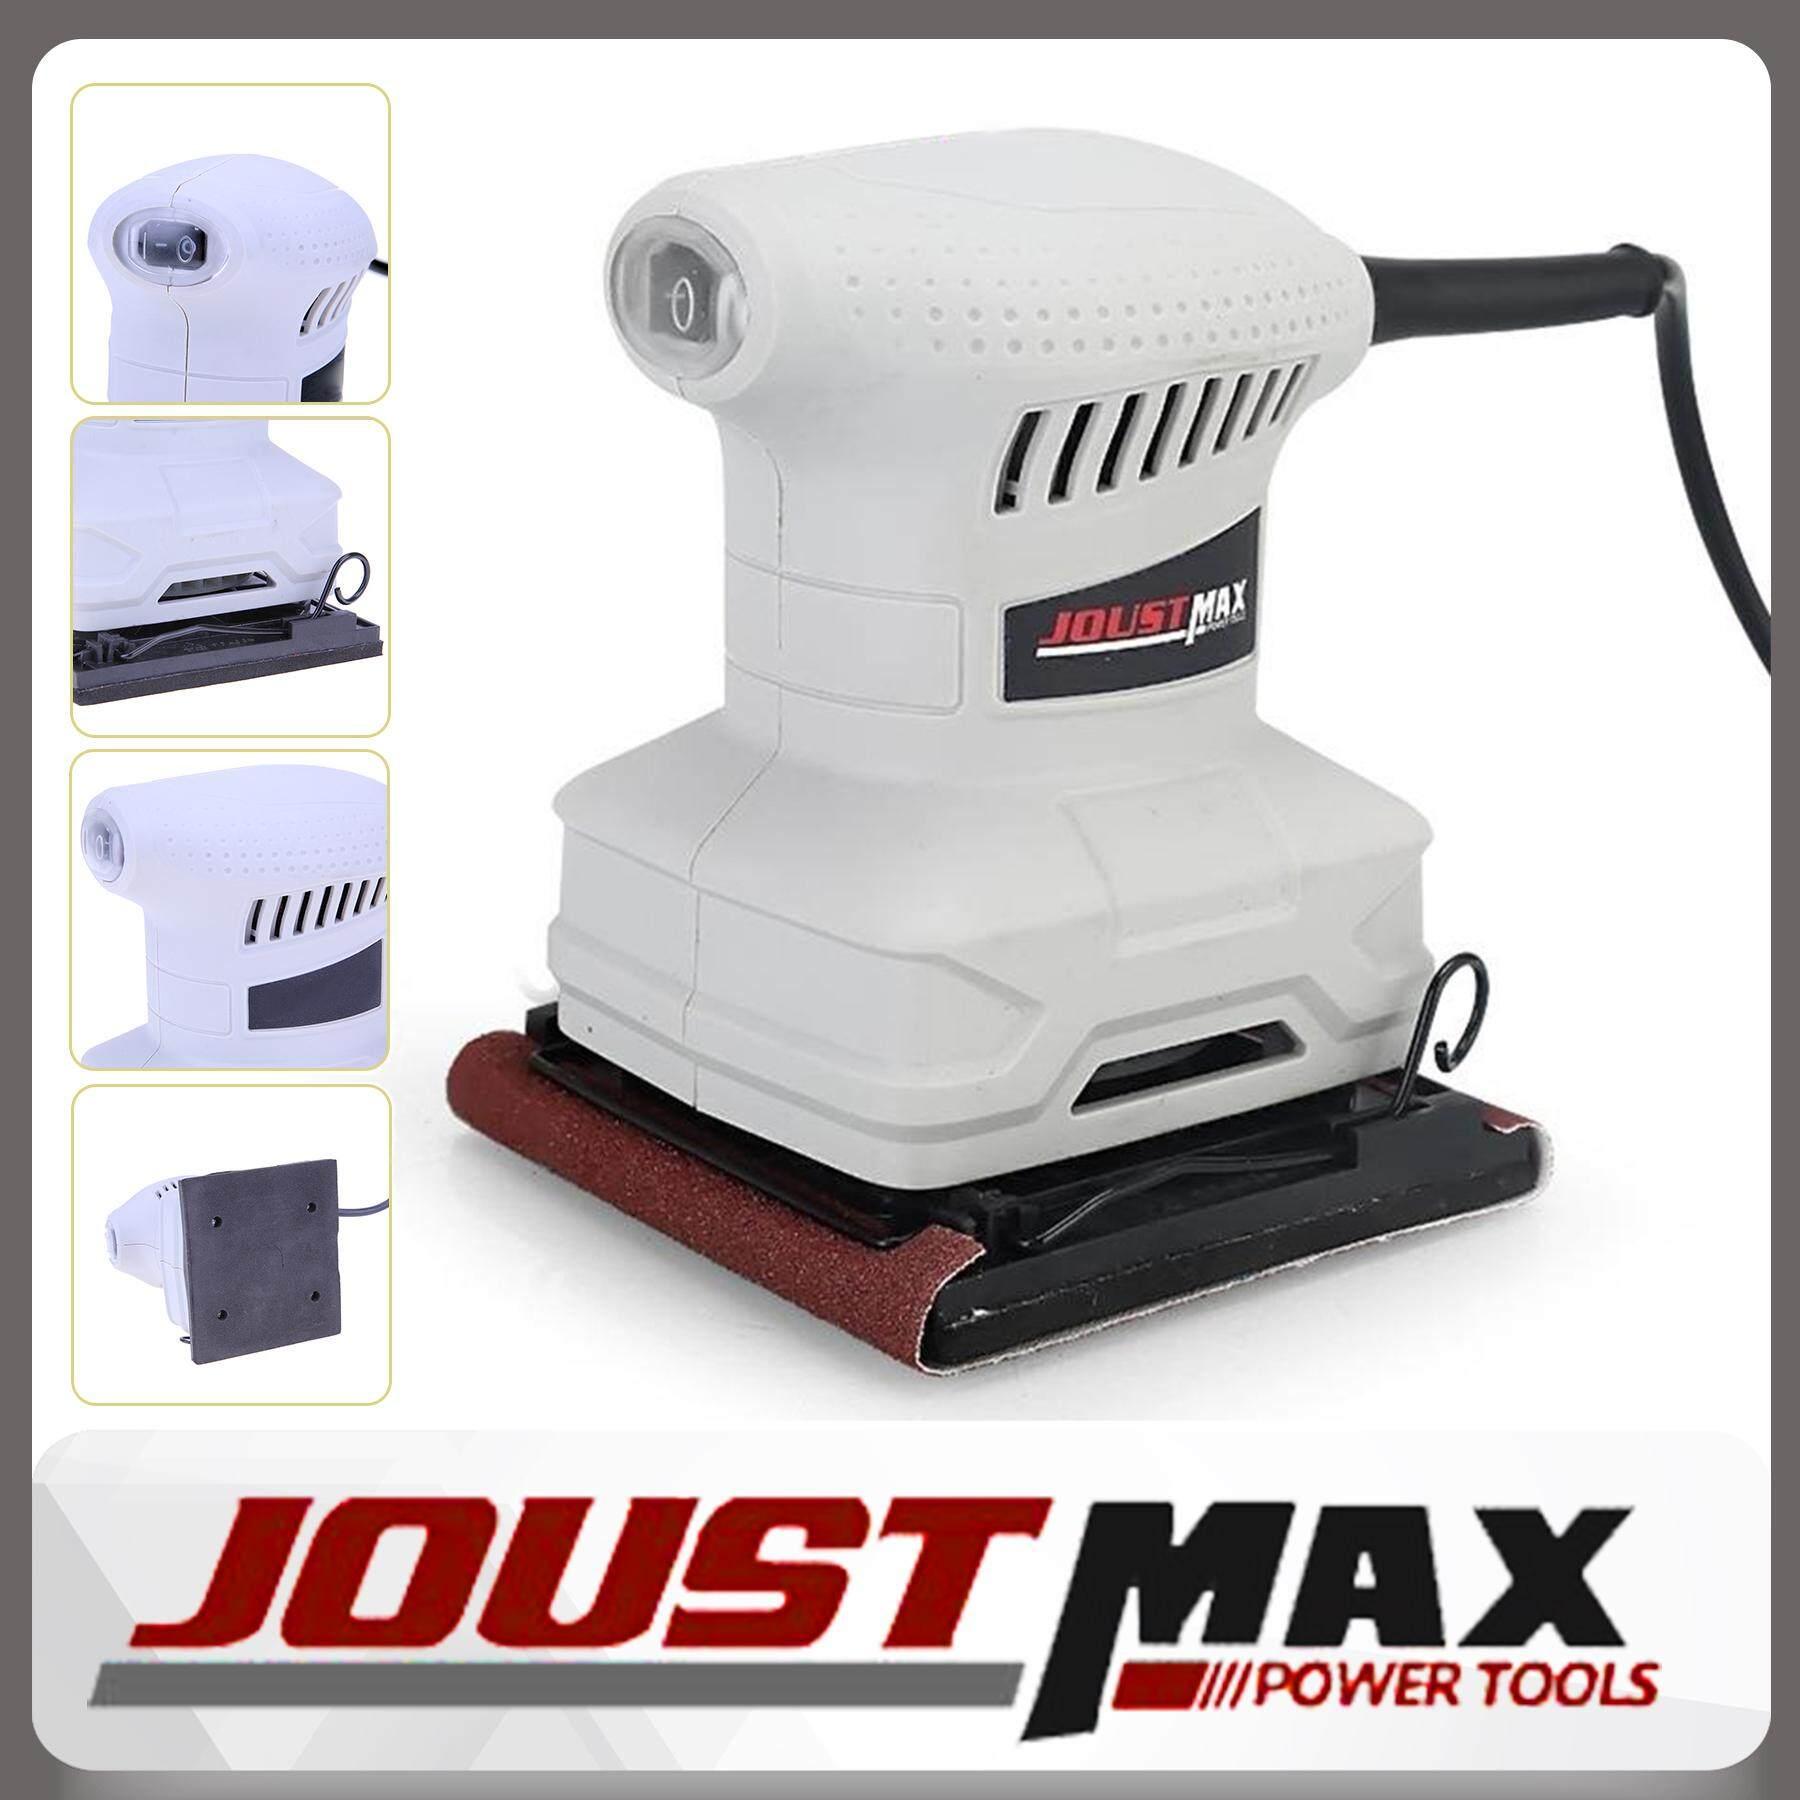 JoustMax JST61101 200W Finishing Sander Woodworking Tool